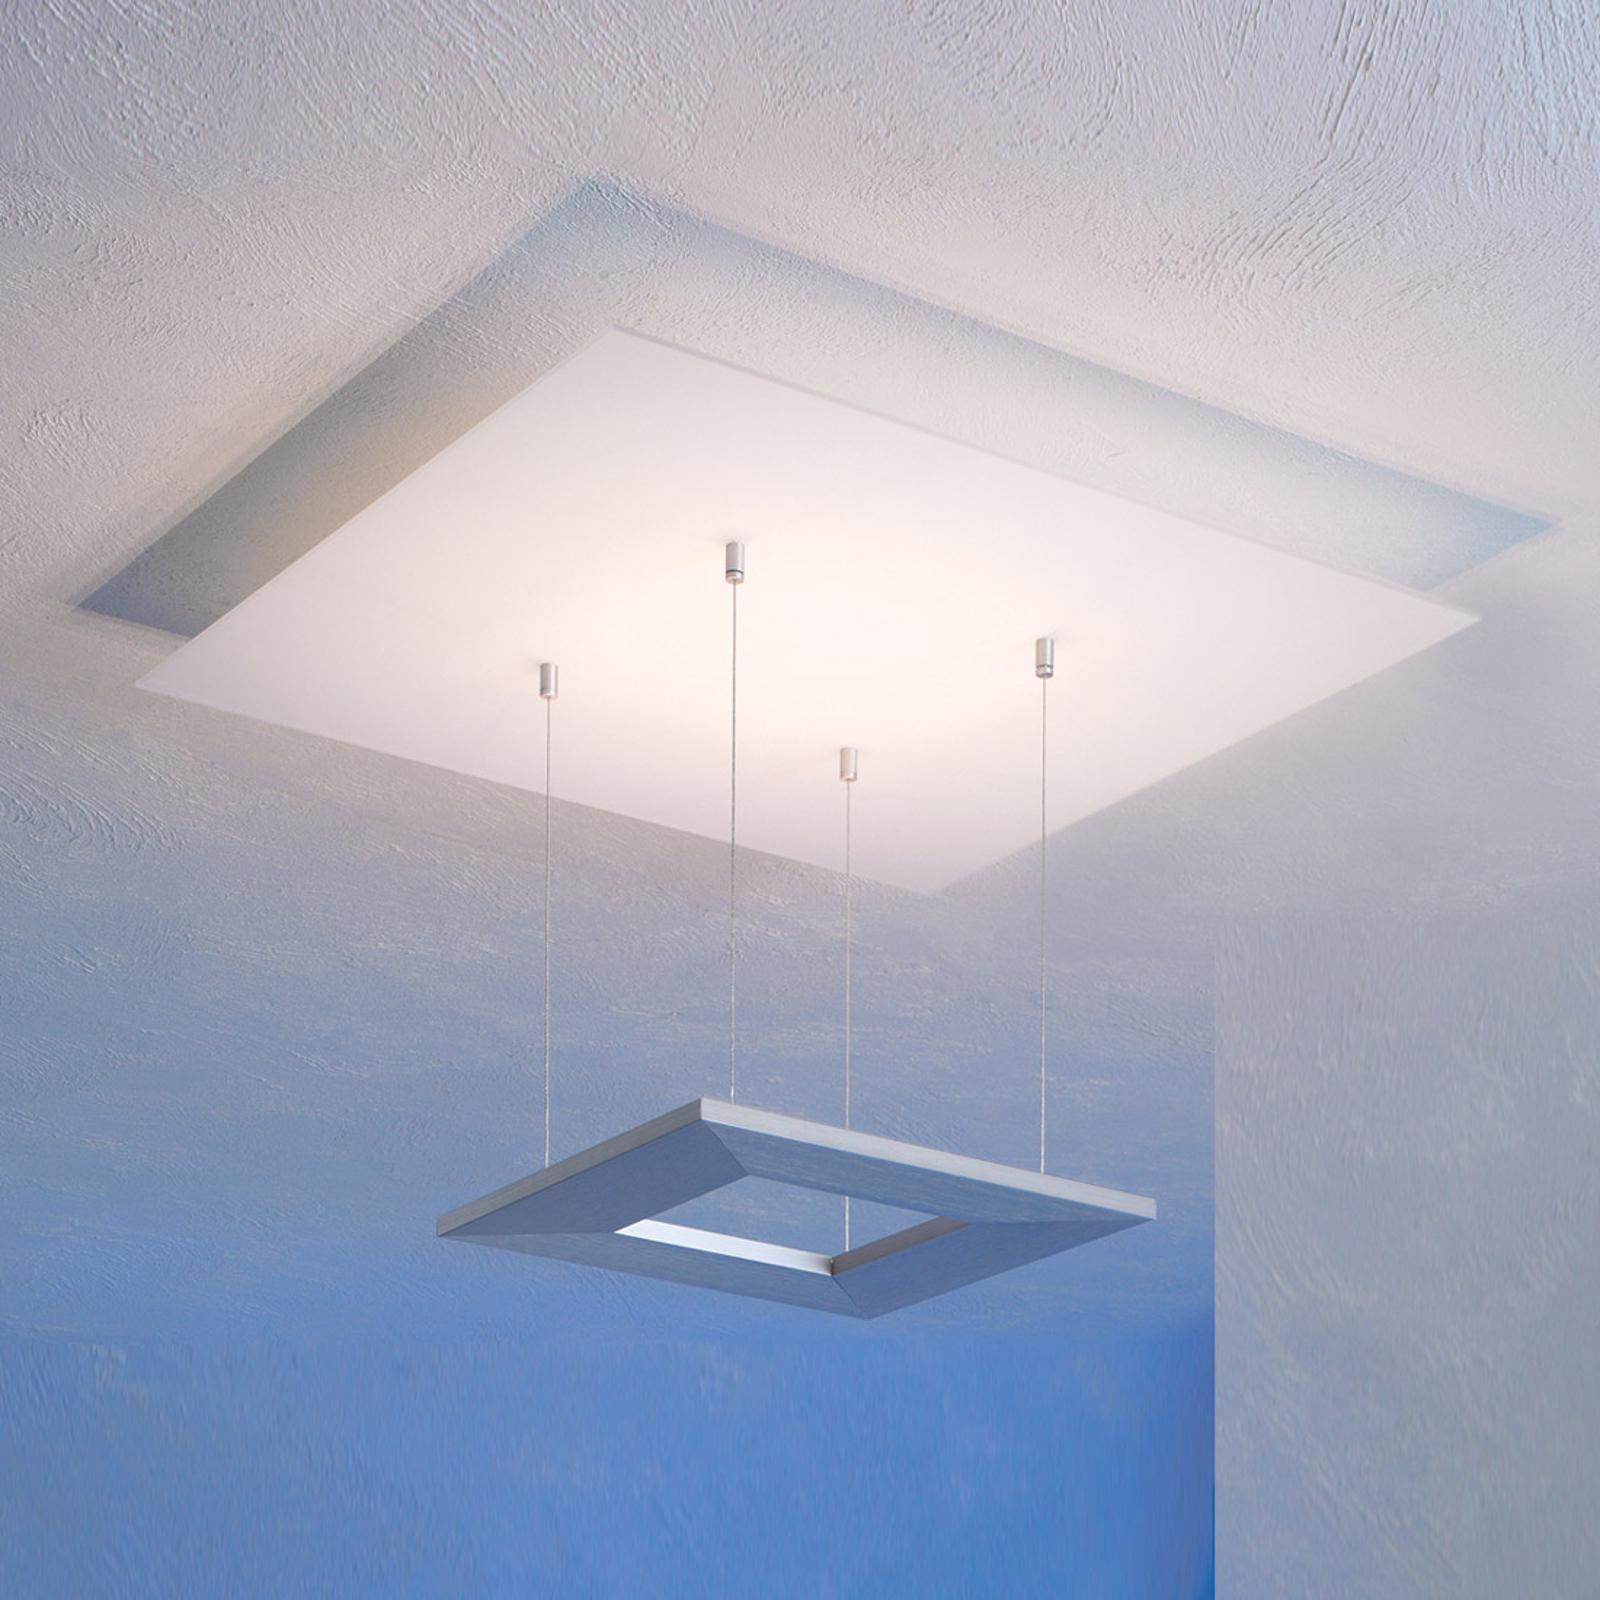 Escale Zen - LED-loftslampe i aluminium, 60 cm